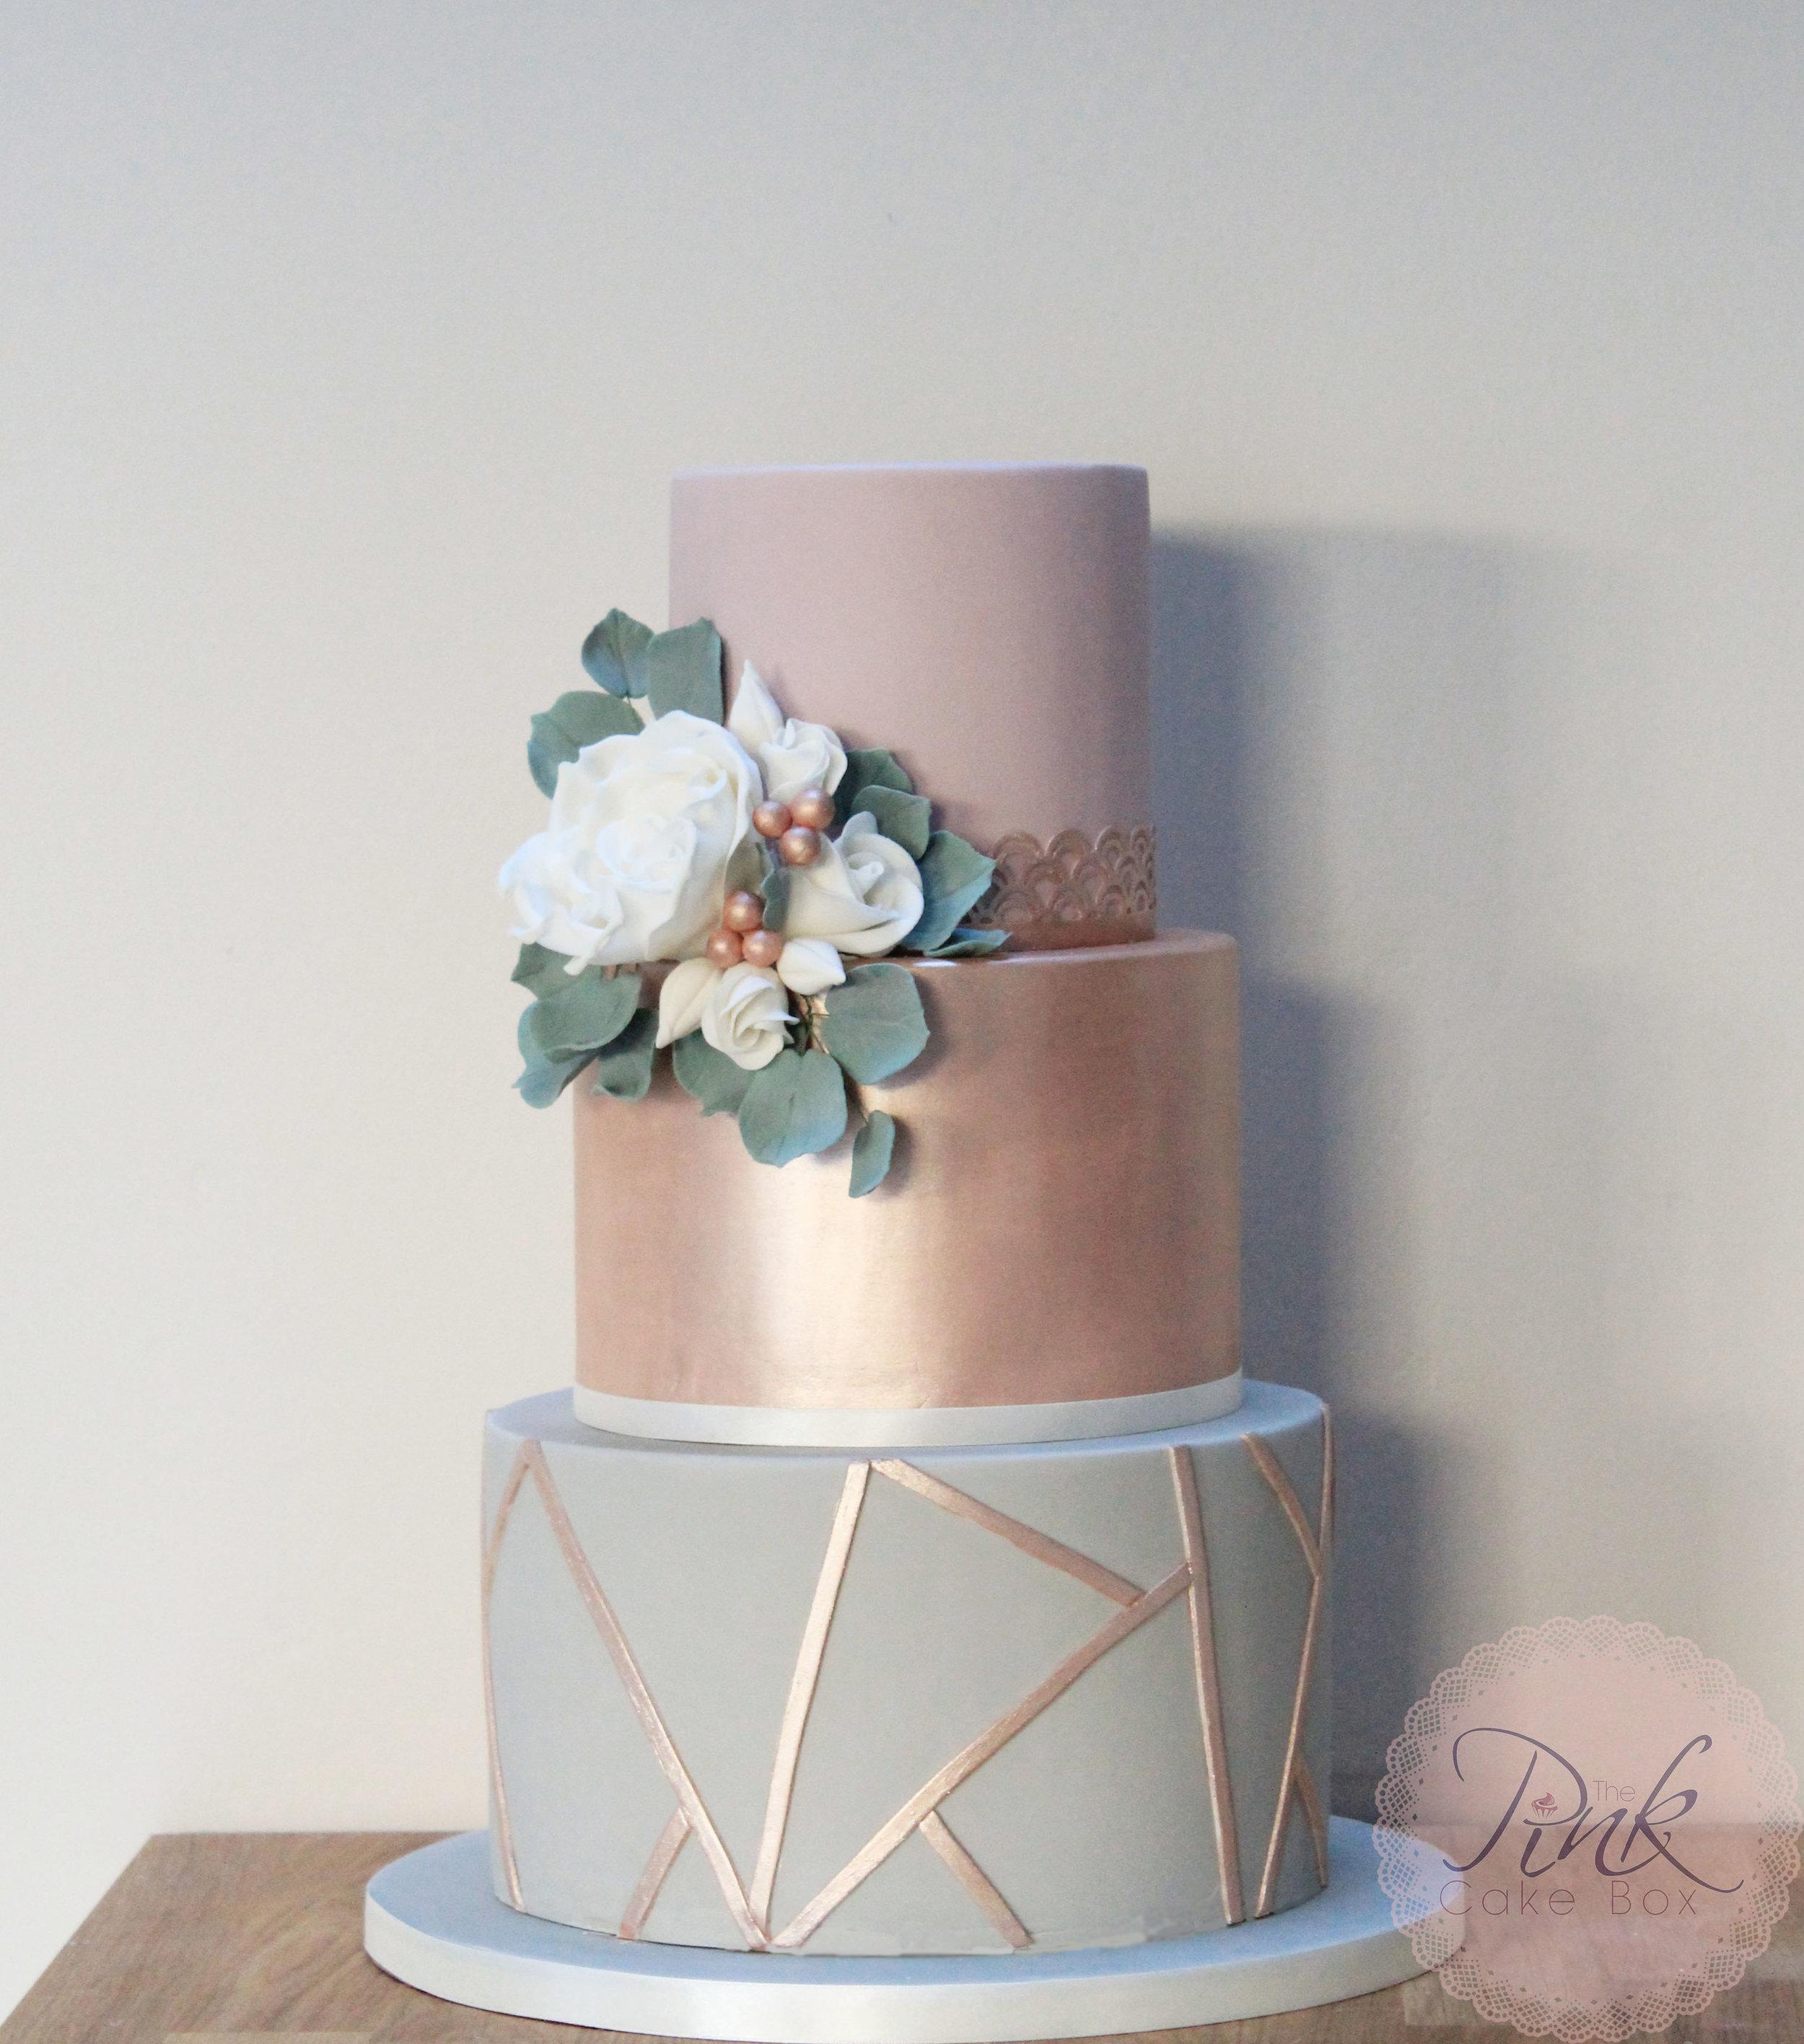 rose gold geometric modern wedding cake design.jpg